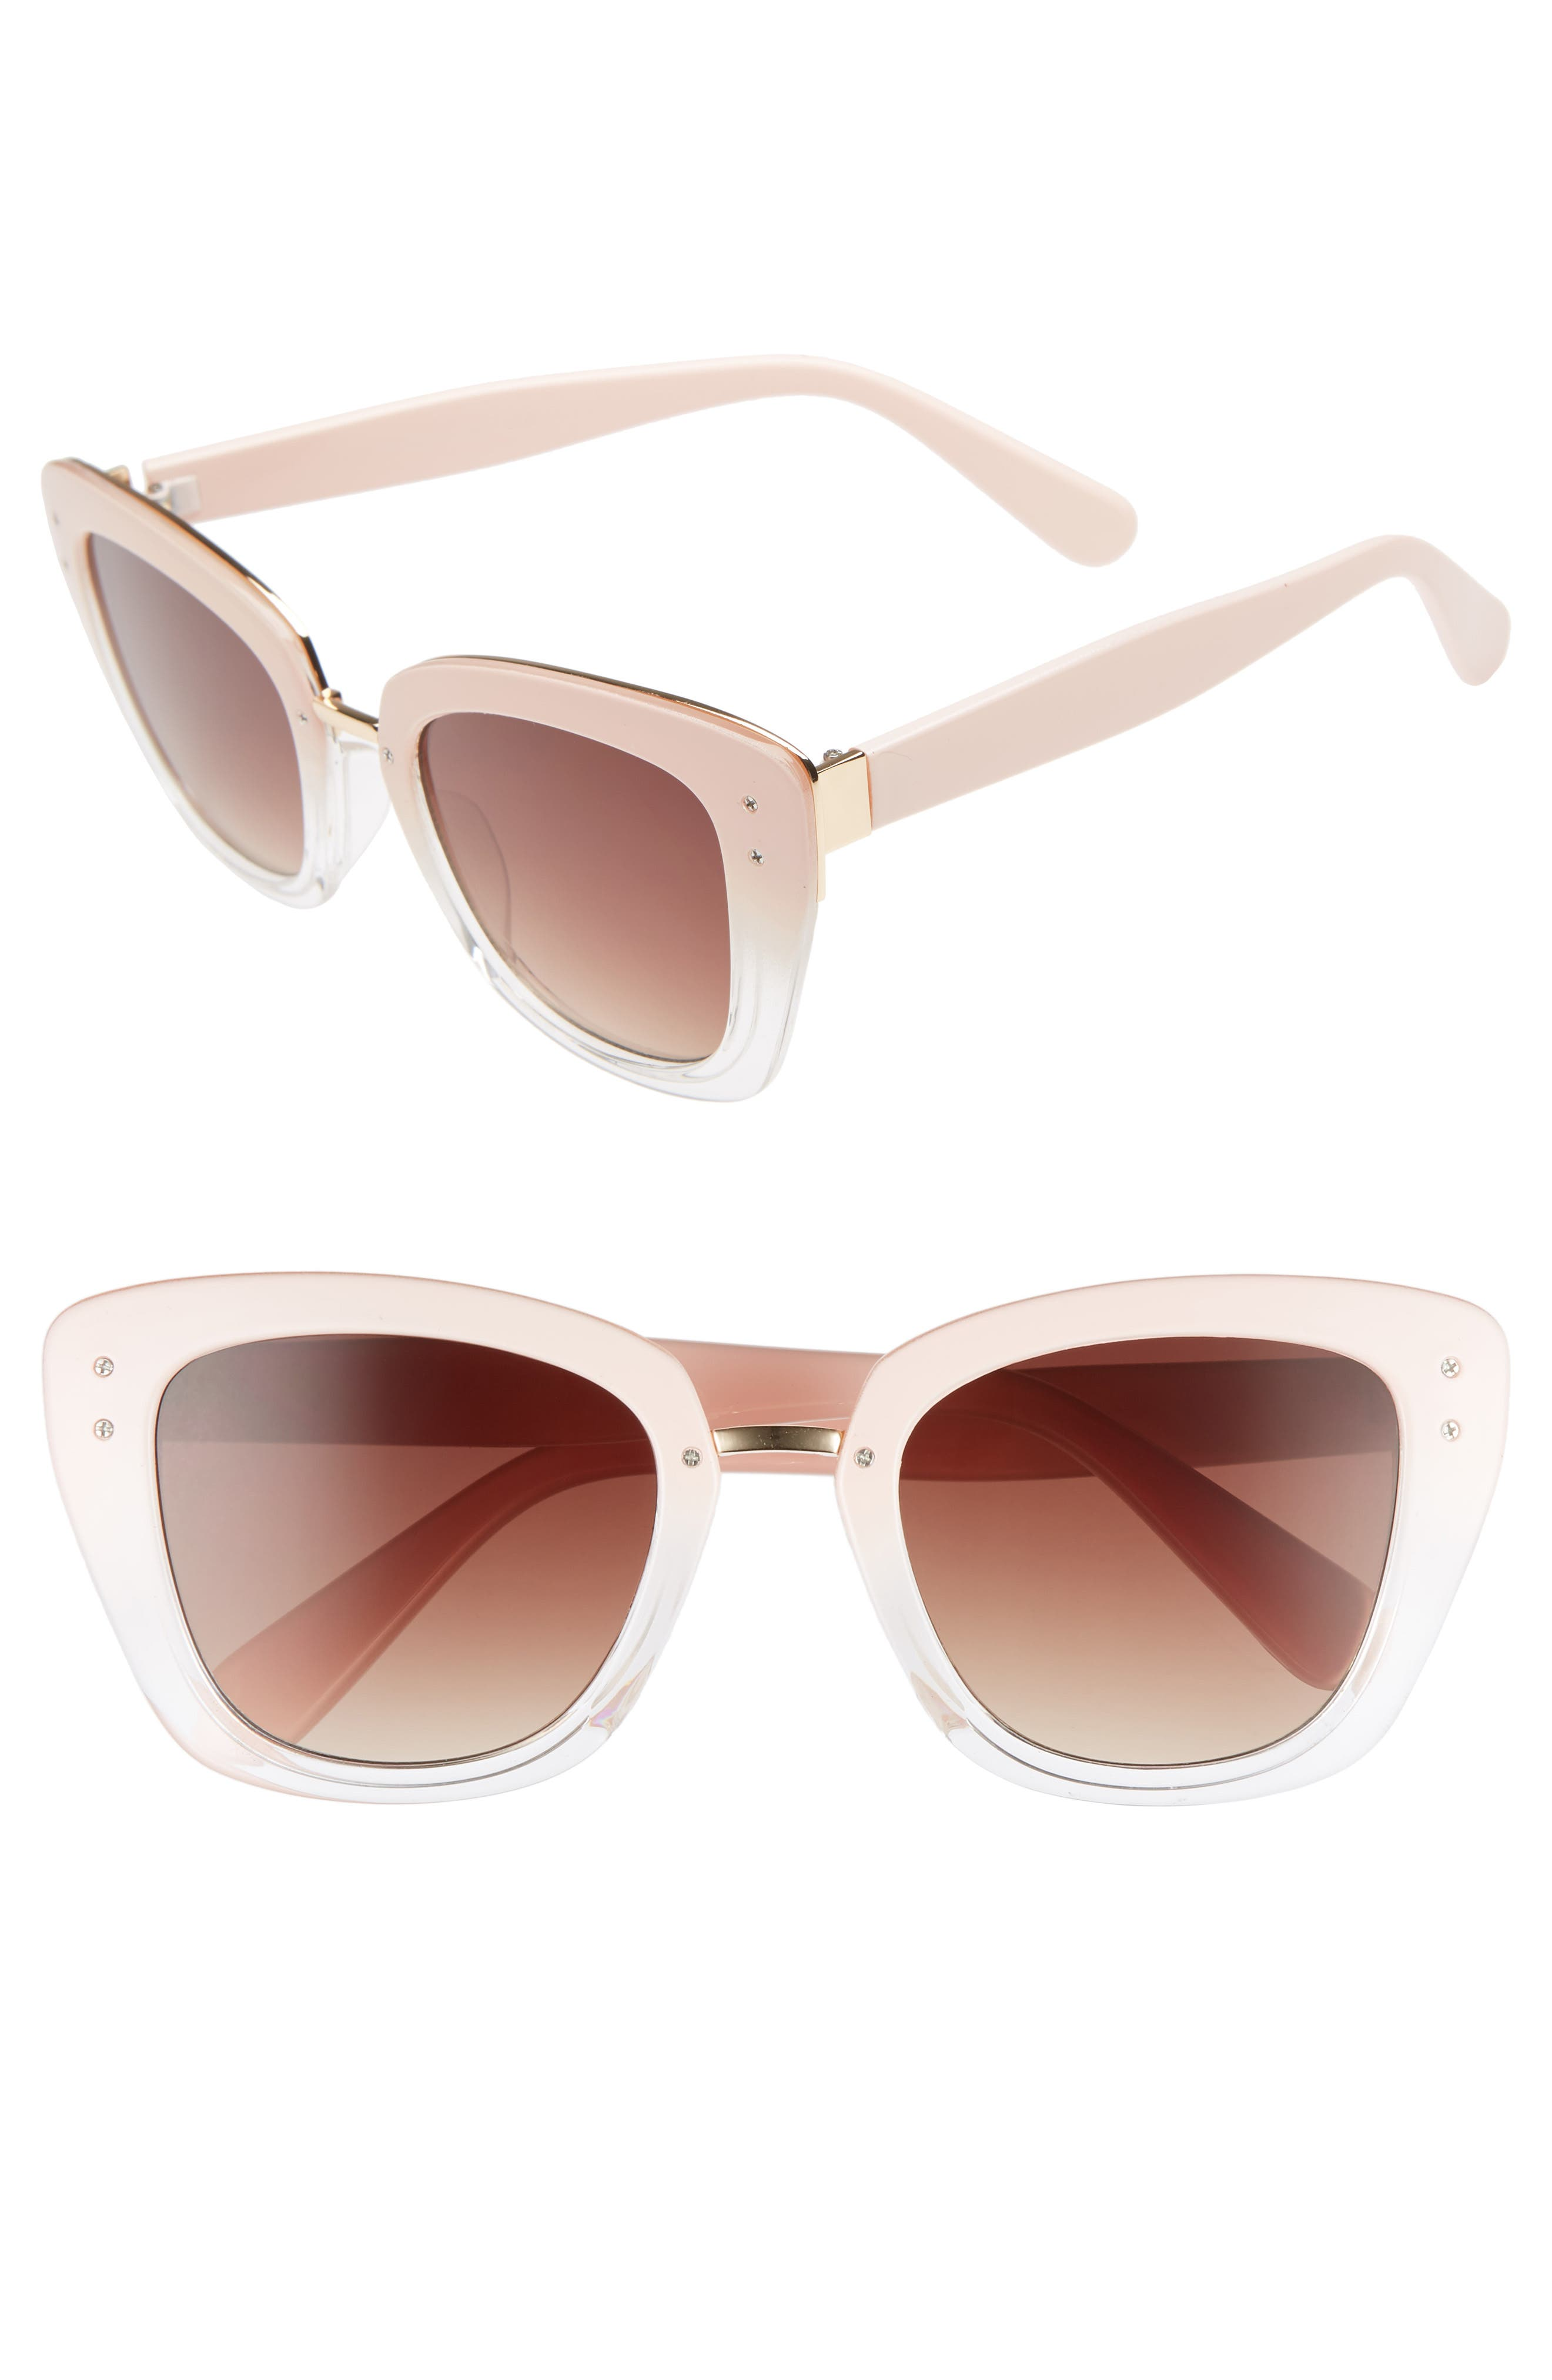 51mm Ombré Square Sunglasses,                             Main thumbnail 1, color,                             Pink/ Clear